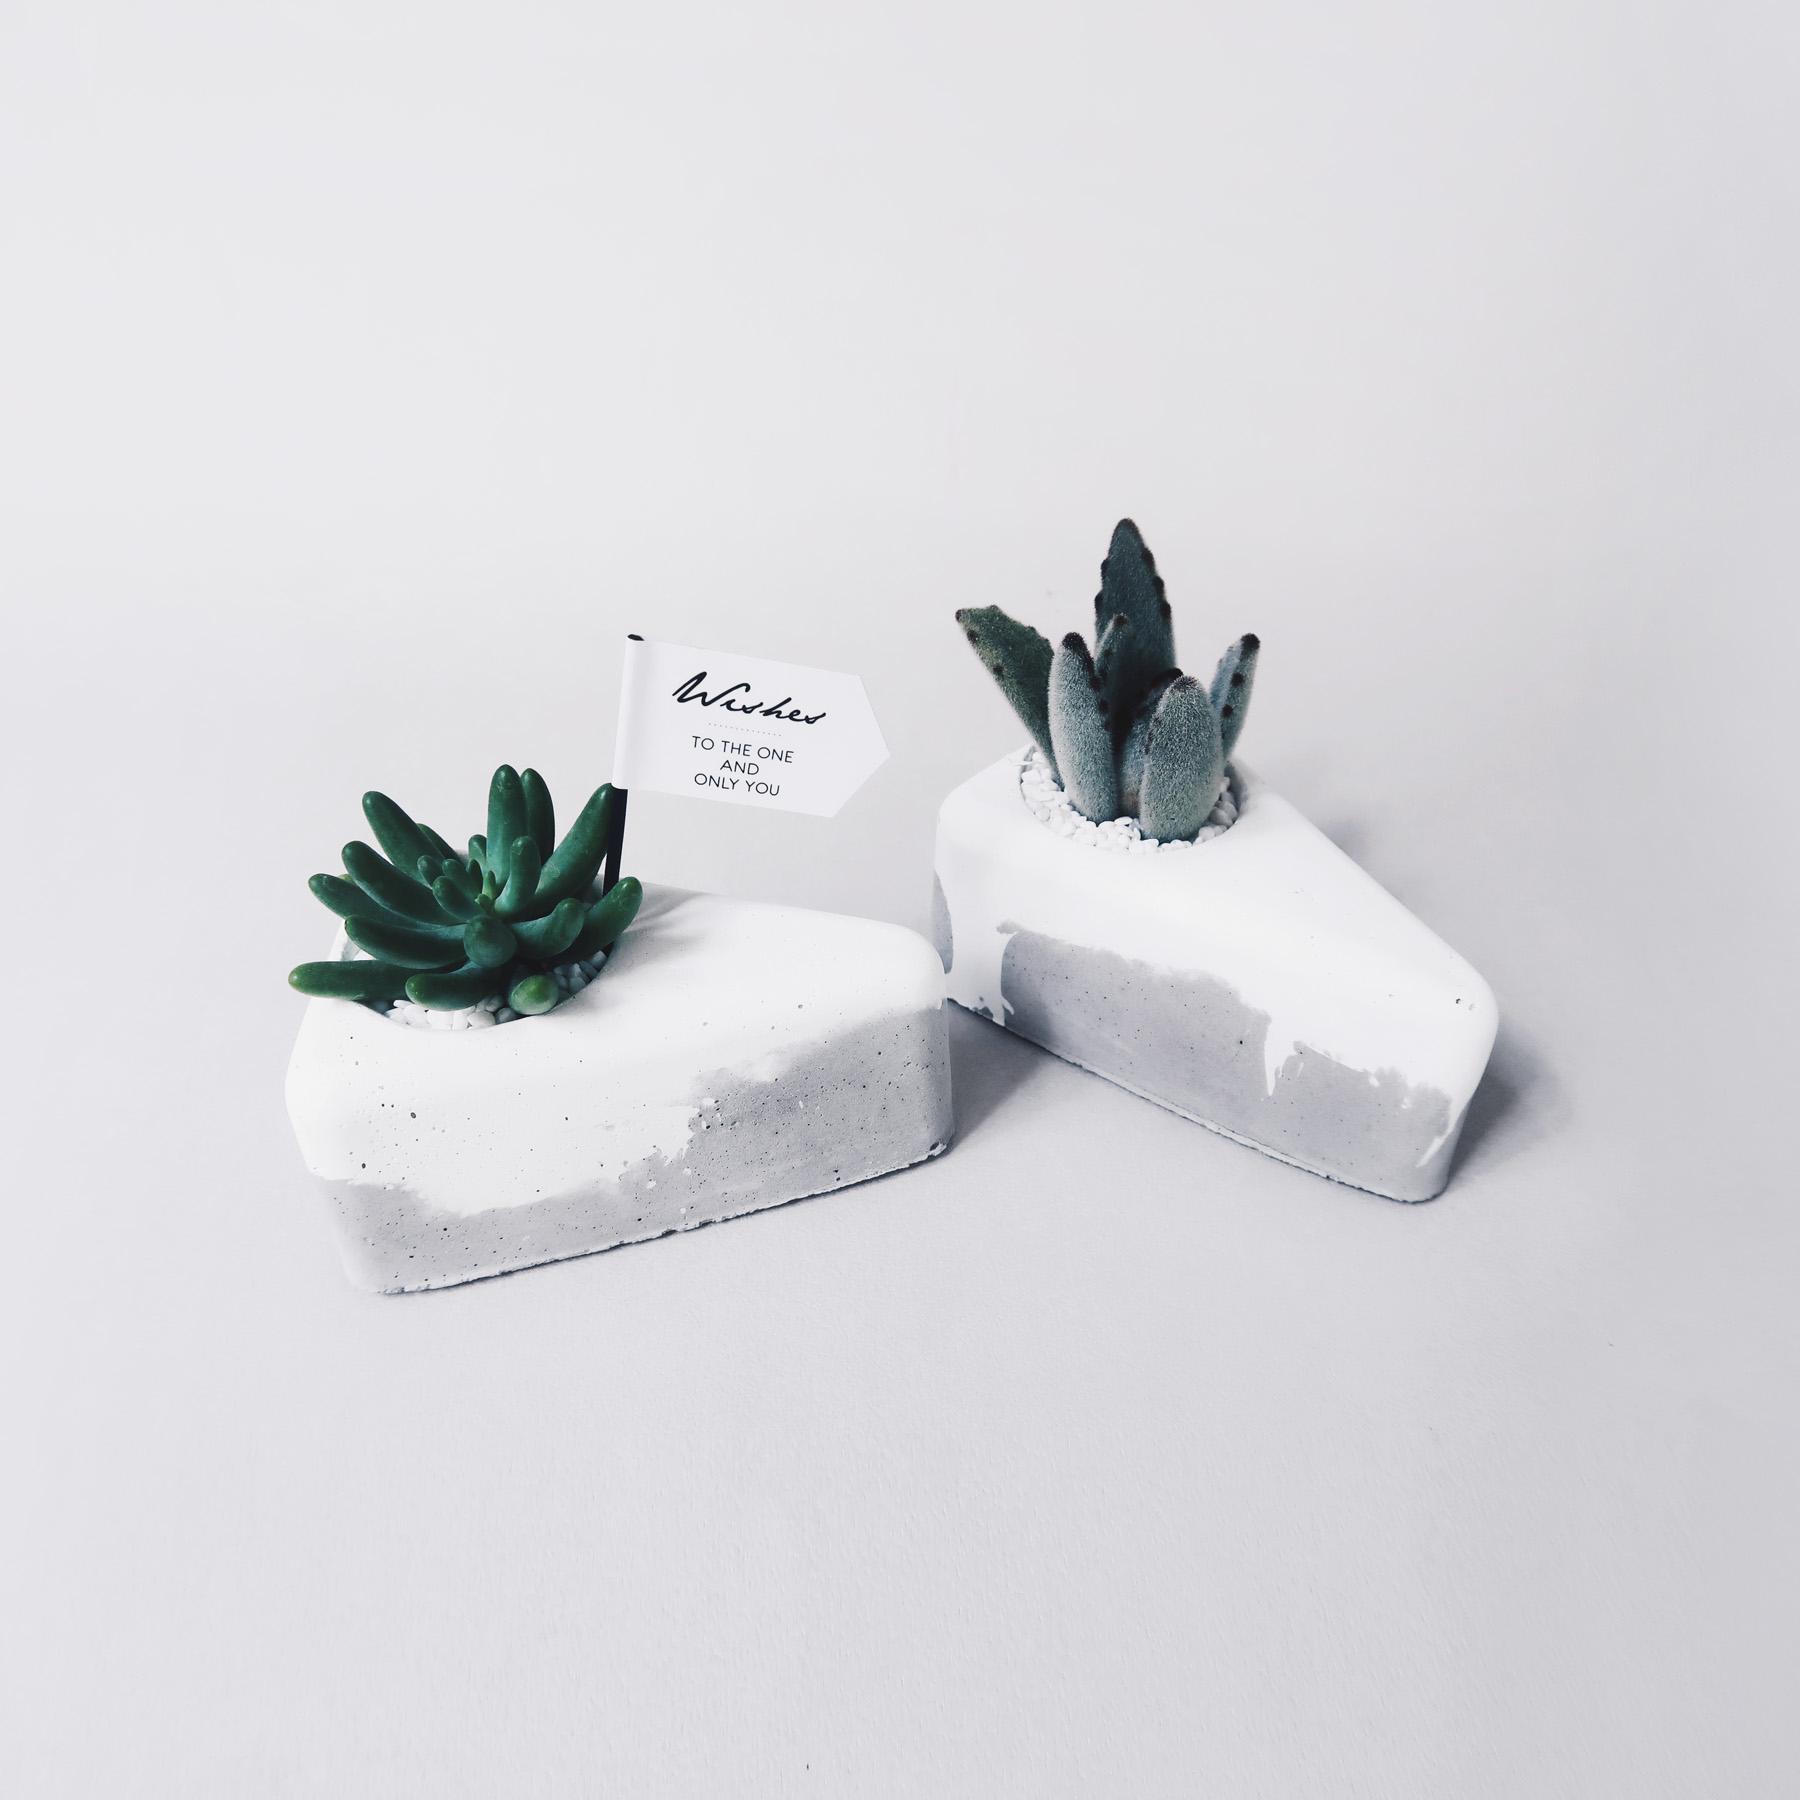 A PIECE OF CAKE 切塊蛋糕 / 仙人掌・多肉雙層鮮奶油水泥盆栽